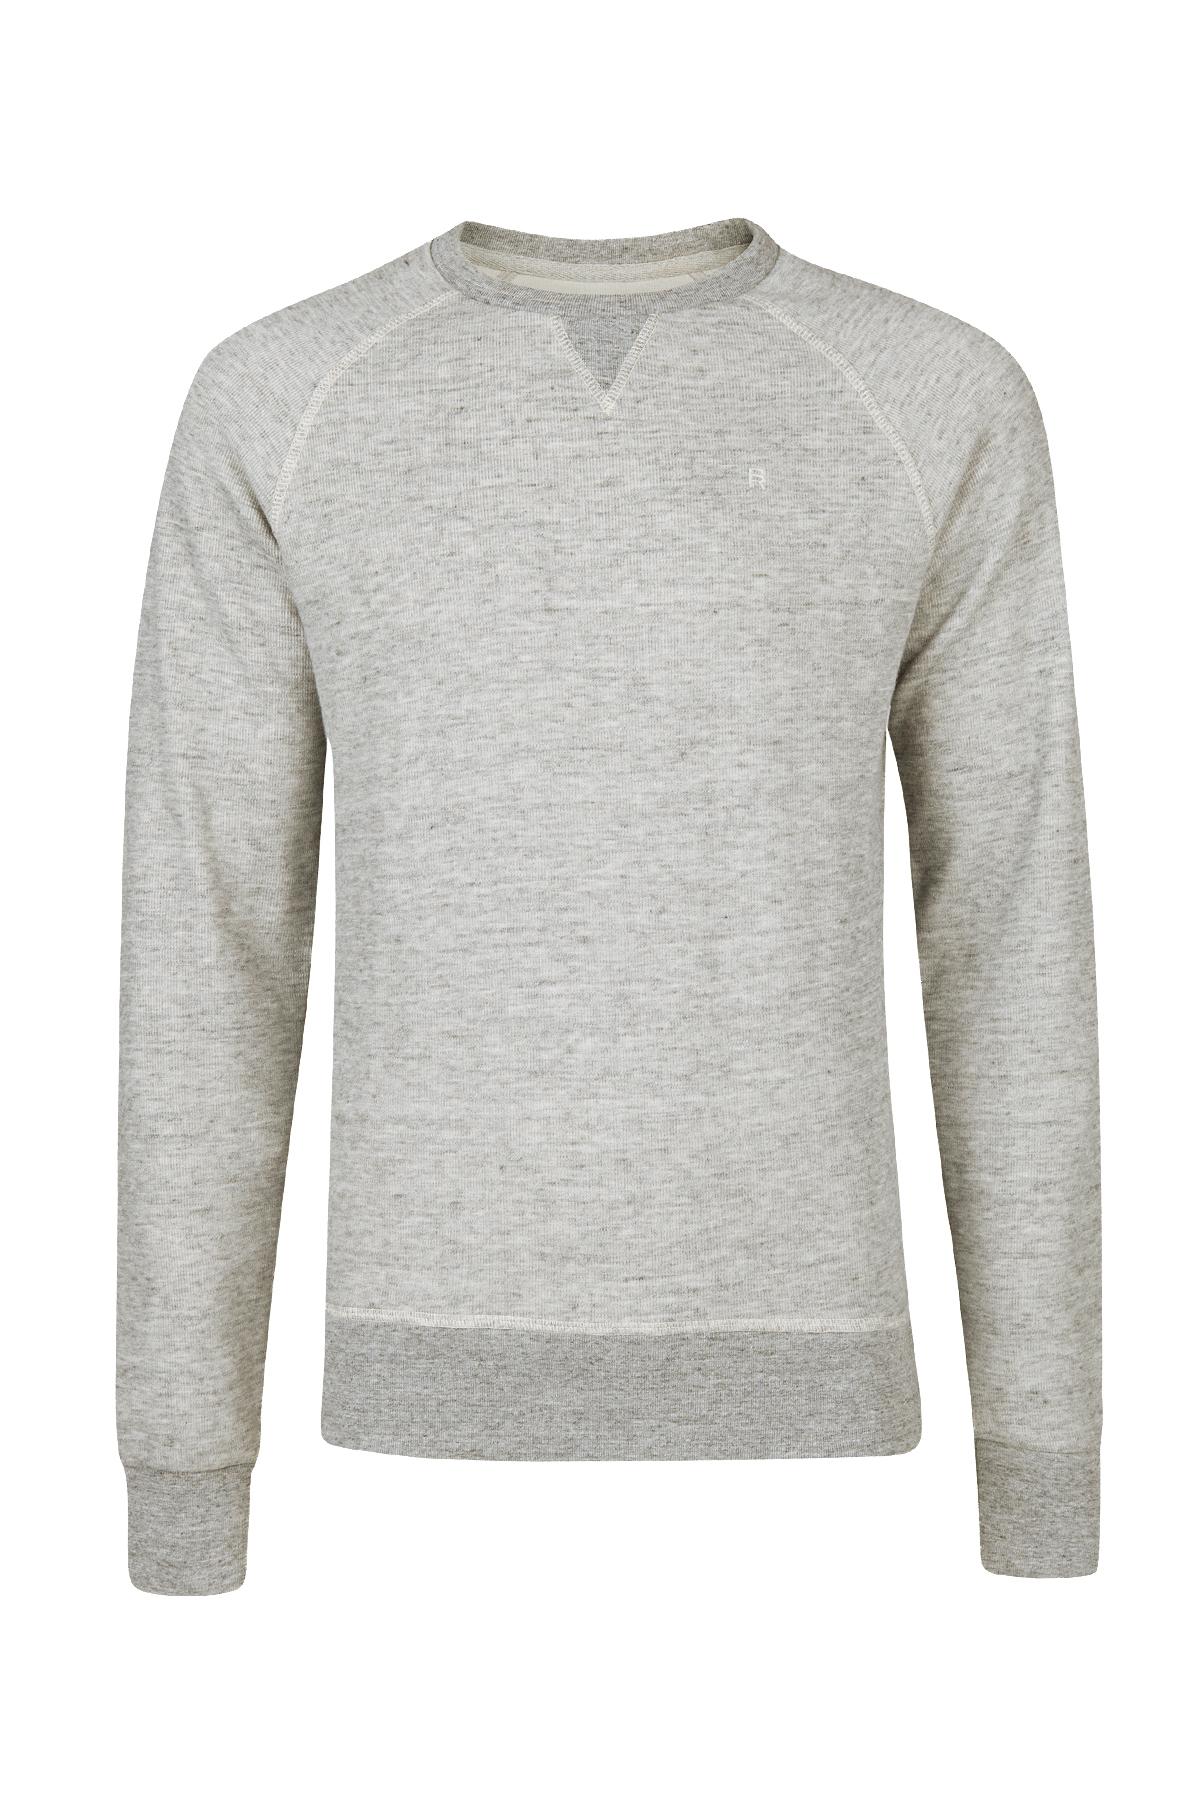 376197bbc85 Heren gemeleerde sweater   94449846 - WE Fashion